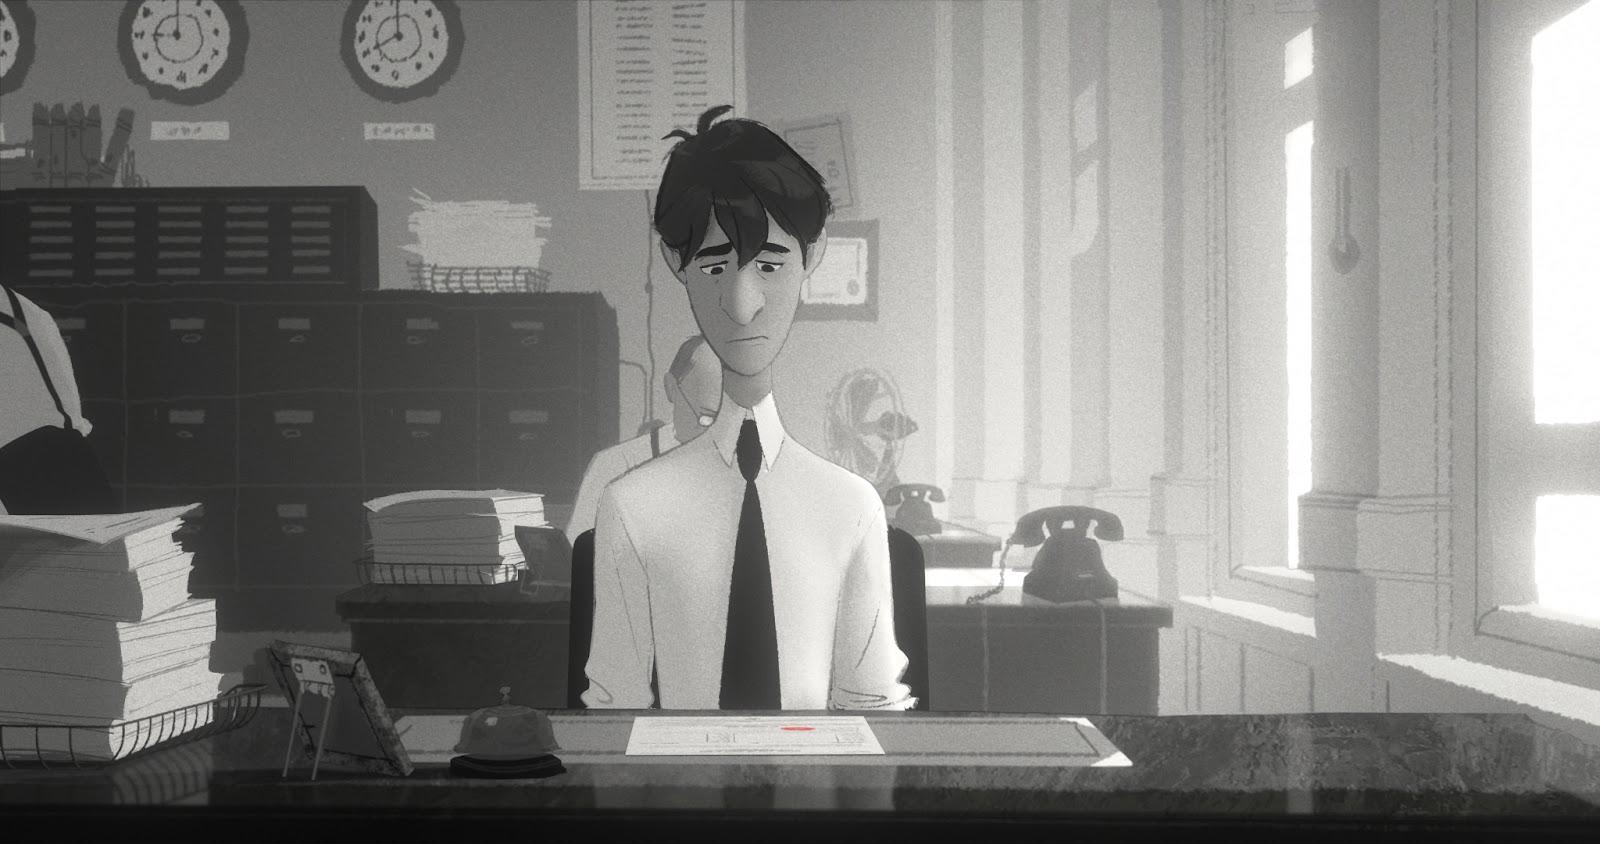 Disney: Paperman